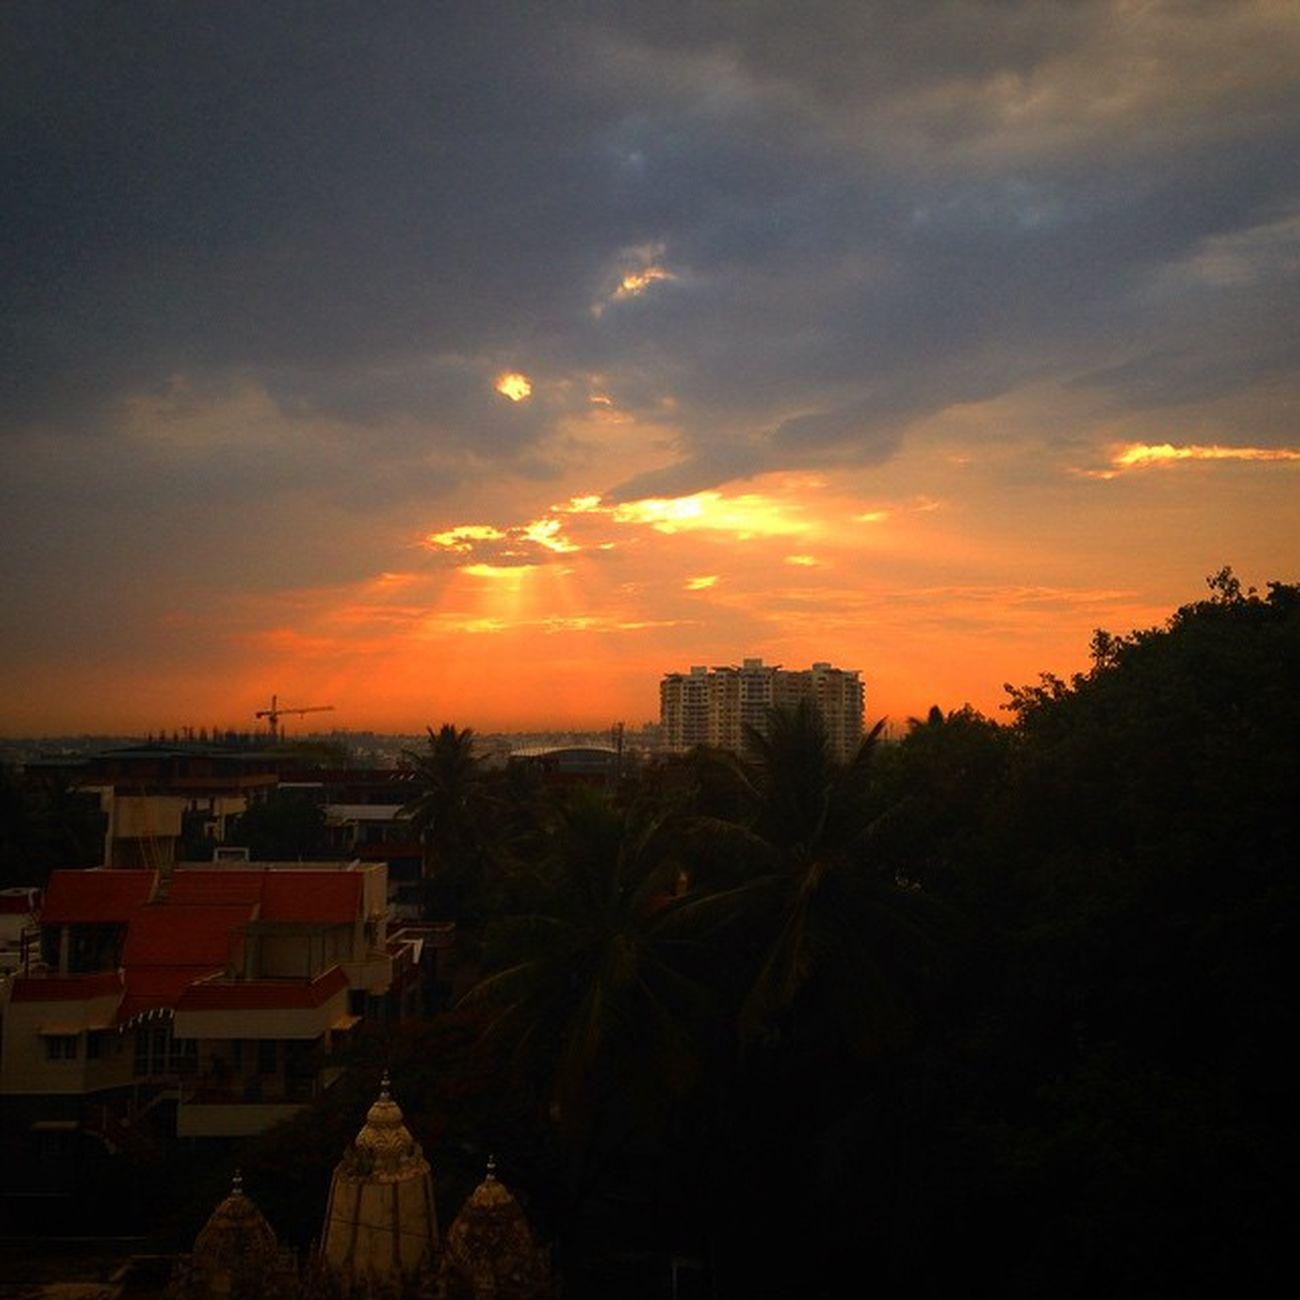 Another awesome sunset even today Lovebangalore Ssunshot Bangalore Namma_bengaluru Namma_karnataka Nammakarnatakamemes VSCO Vscocam